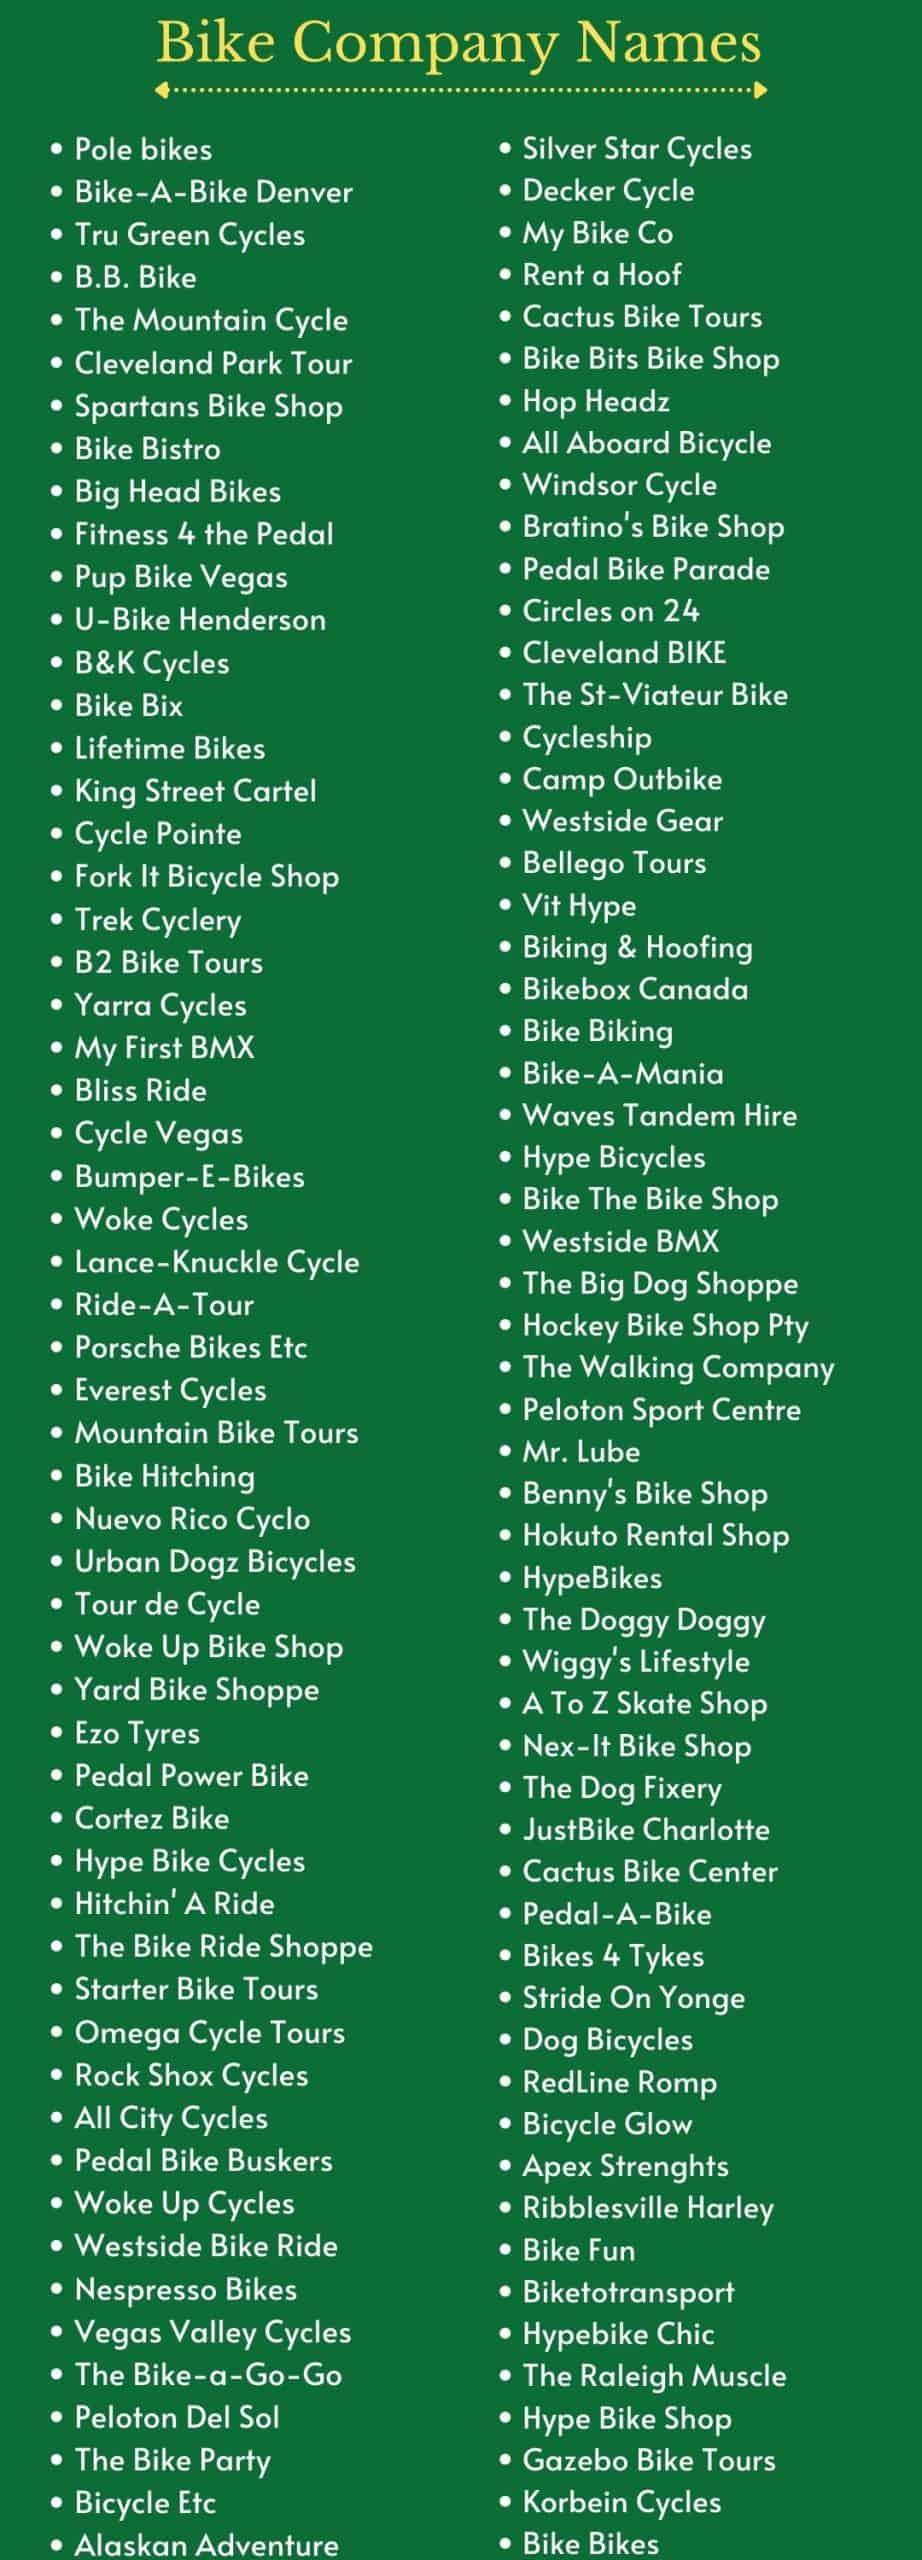 Bike Shop Names and Catchy Bike Company Names